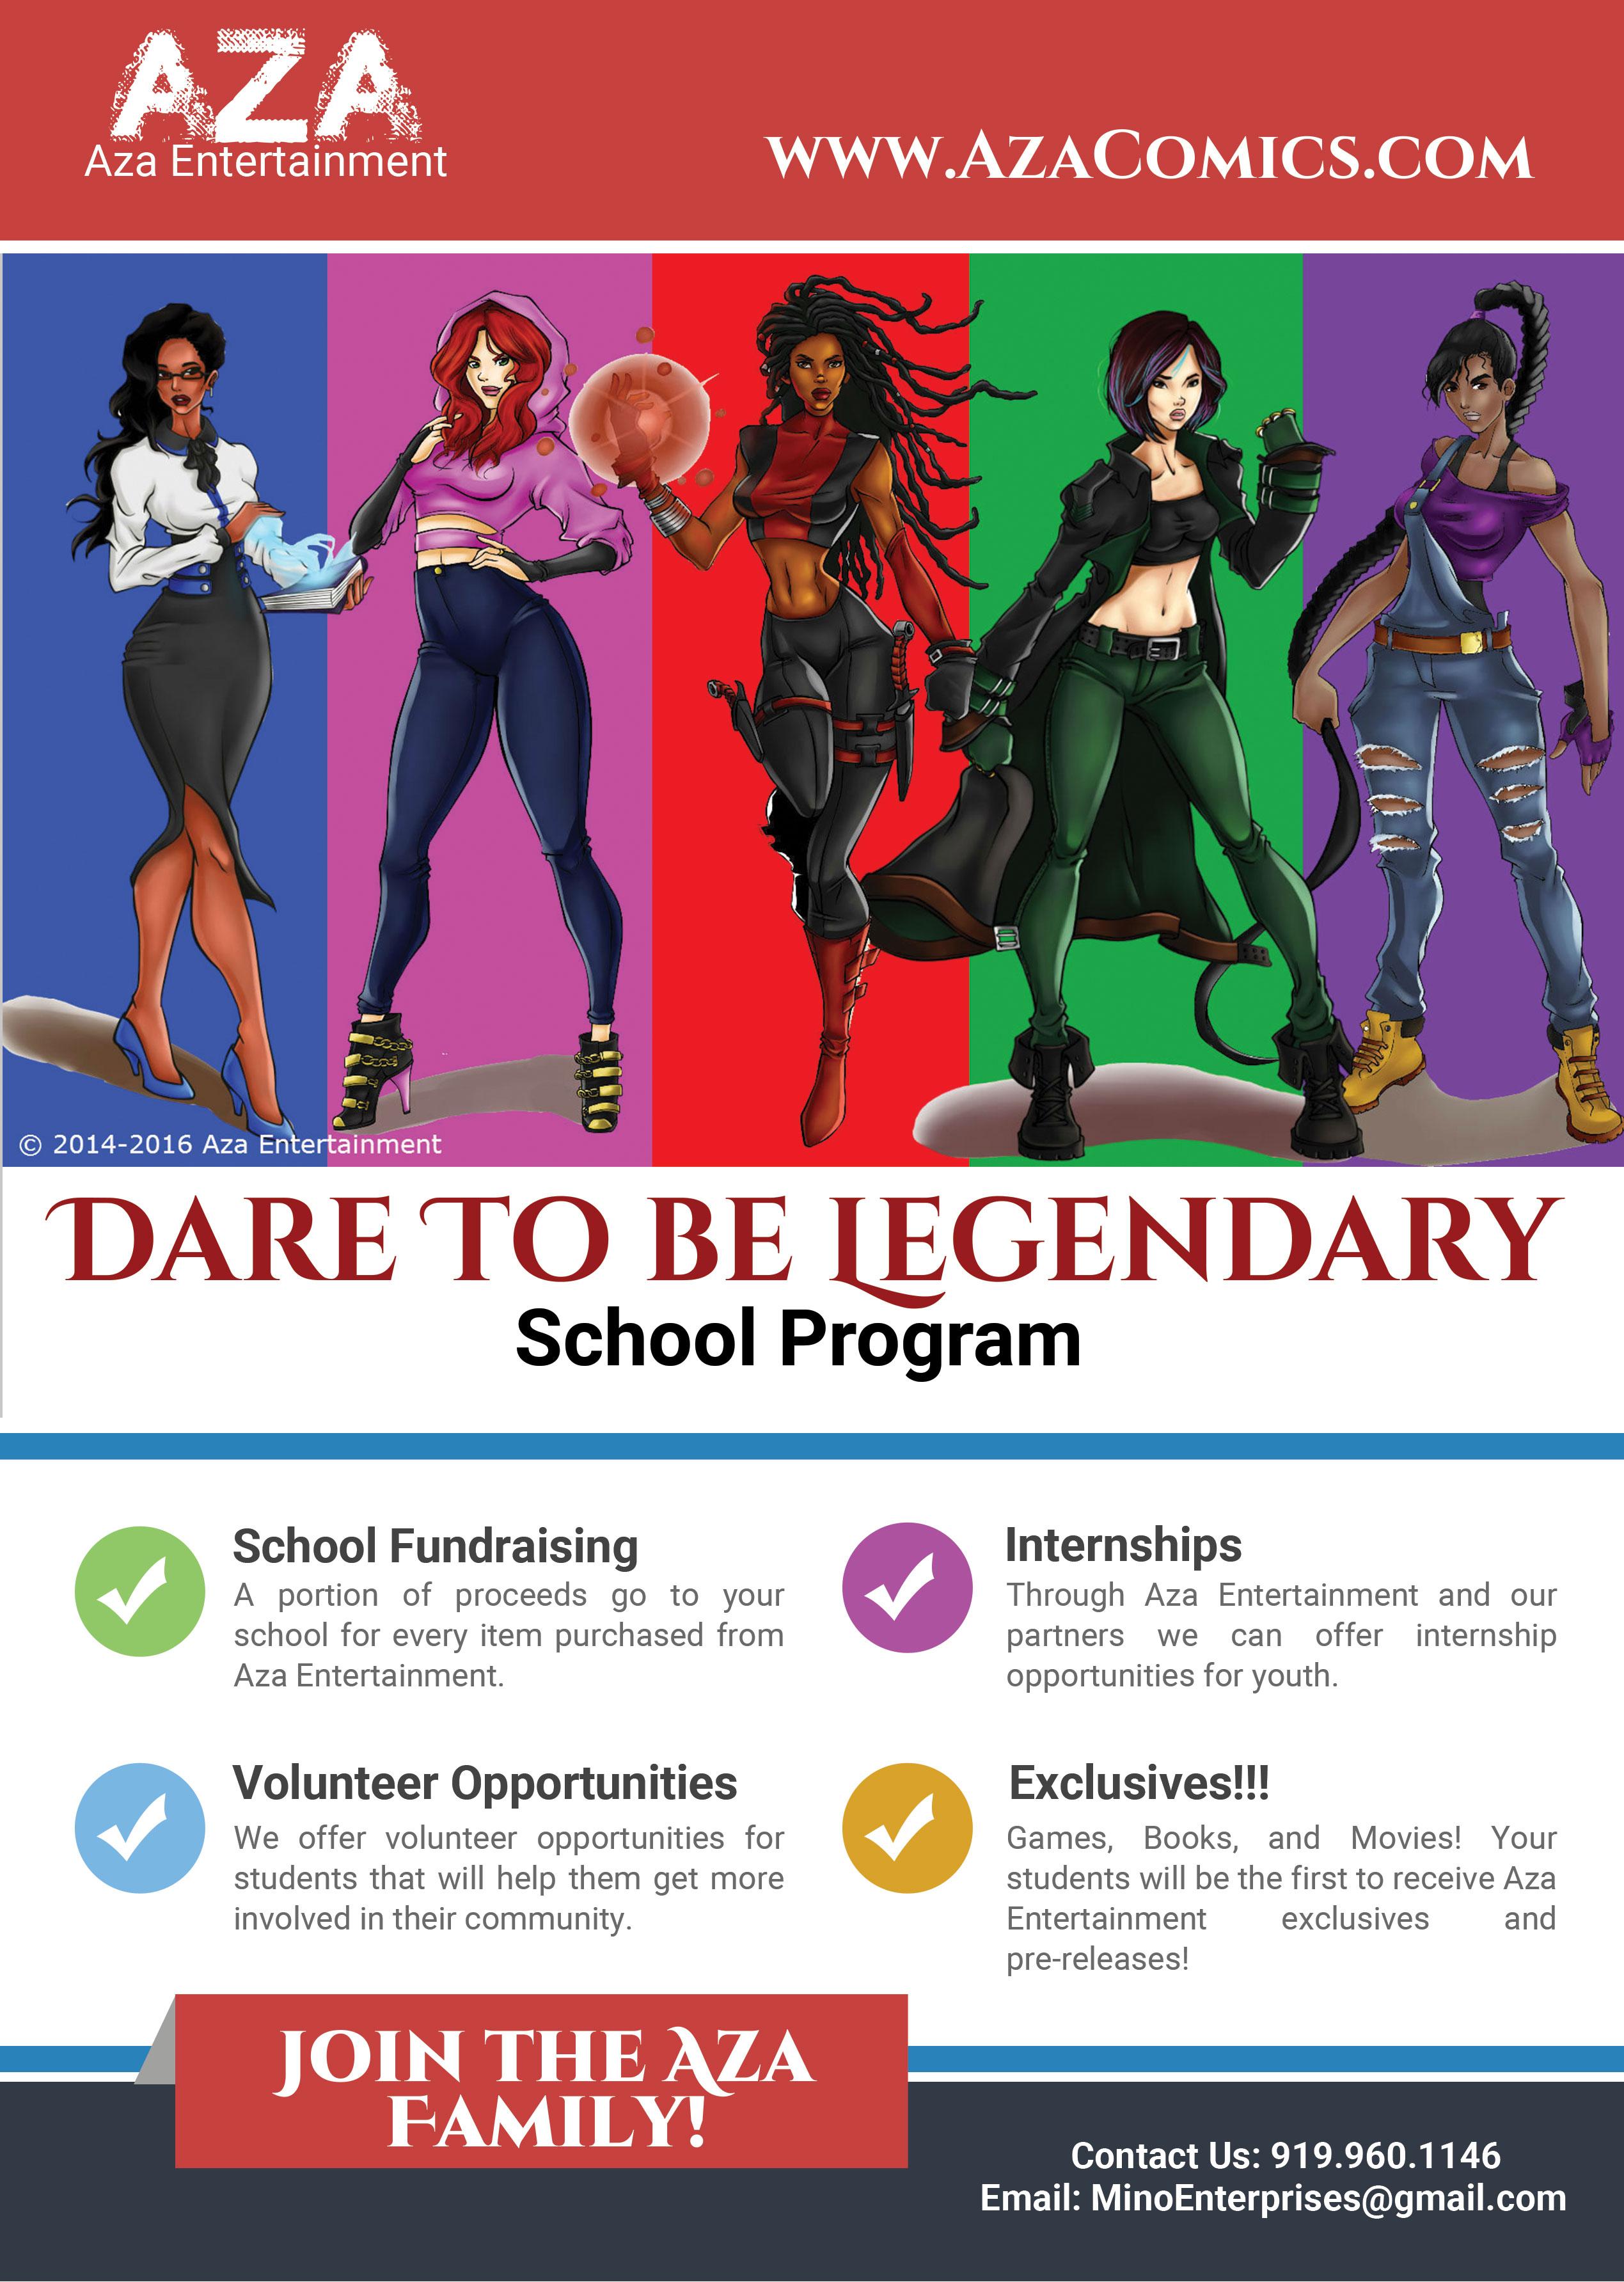 Aza-Entertainment-School-Program